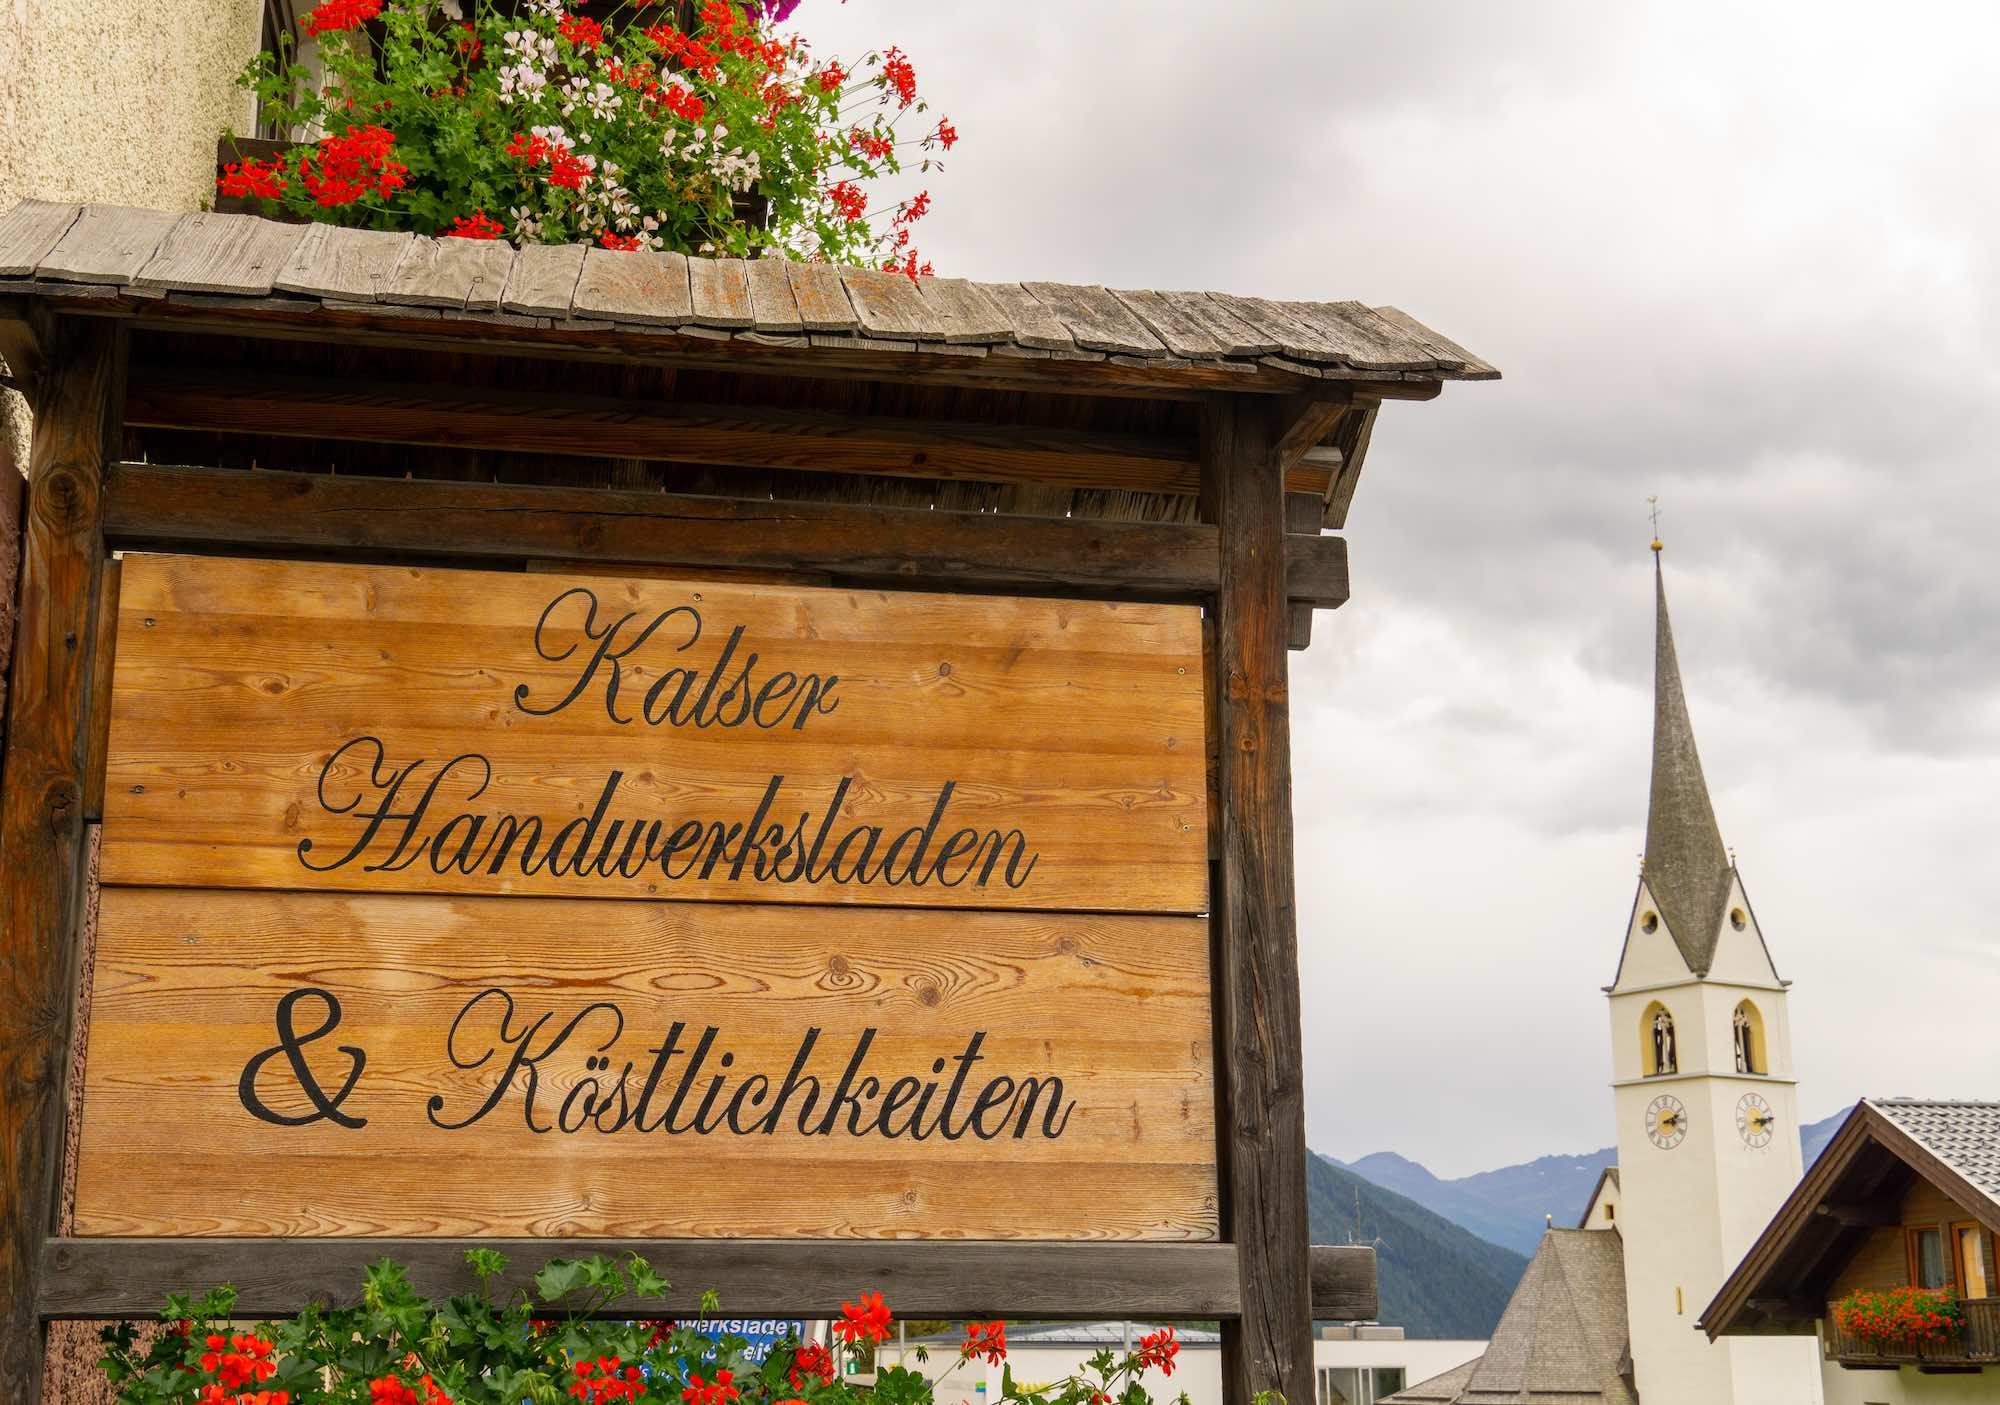 Kalser Handwerksladen, traditional craft shop Austria